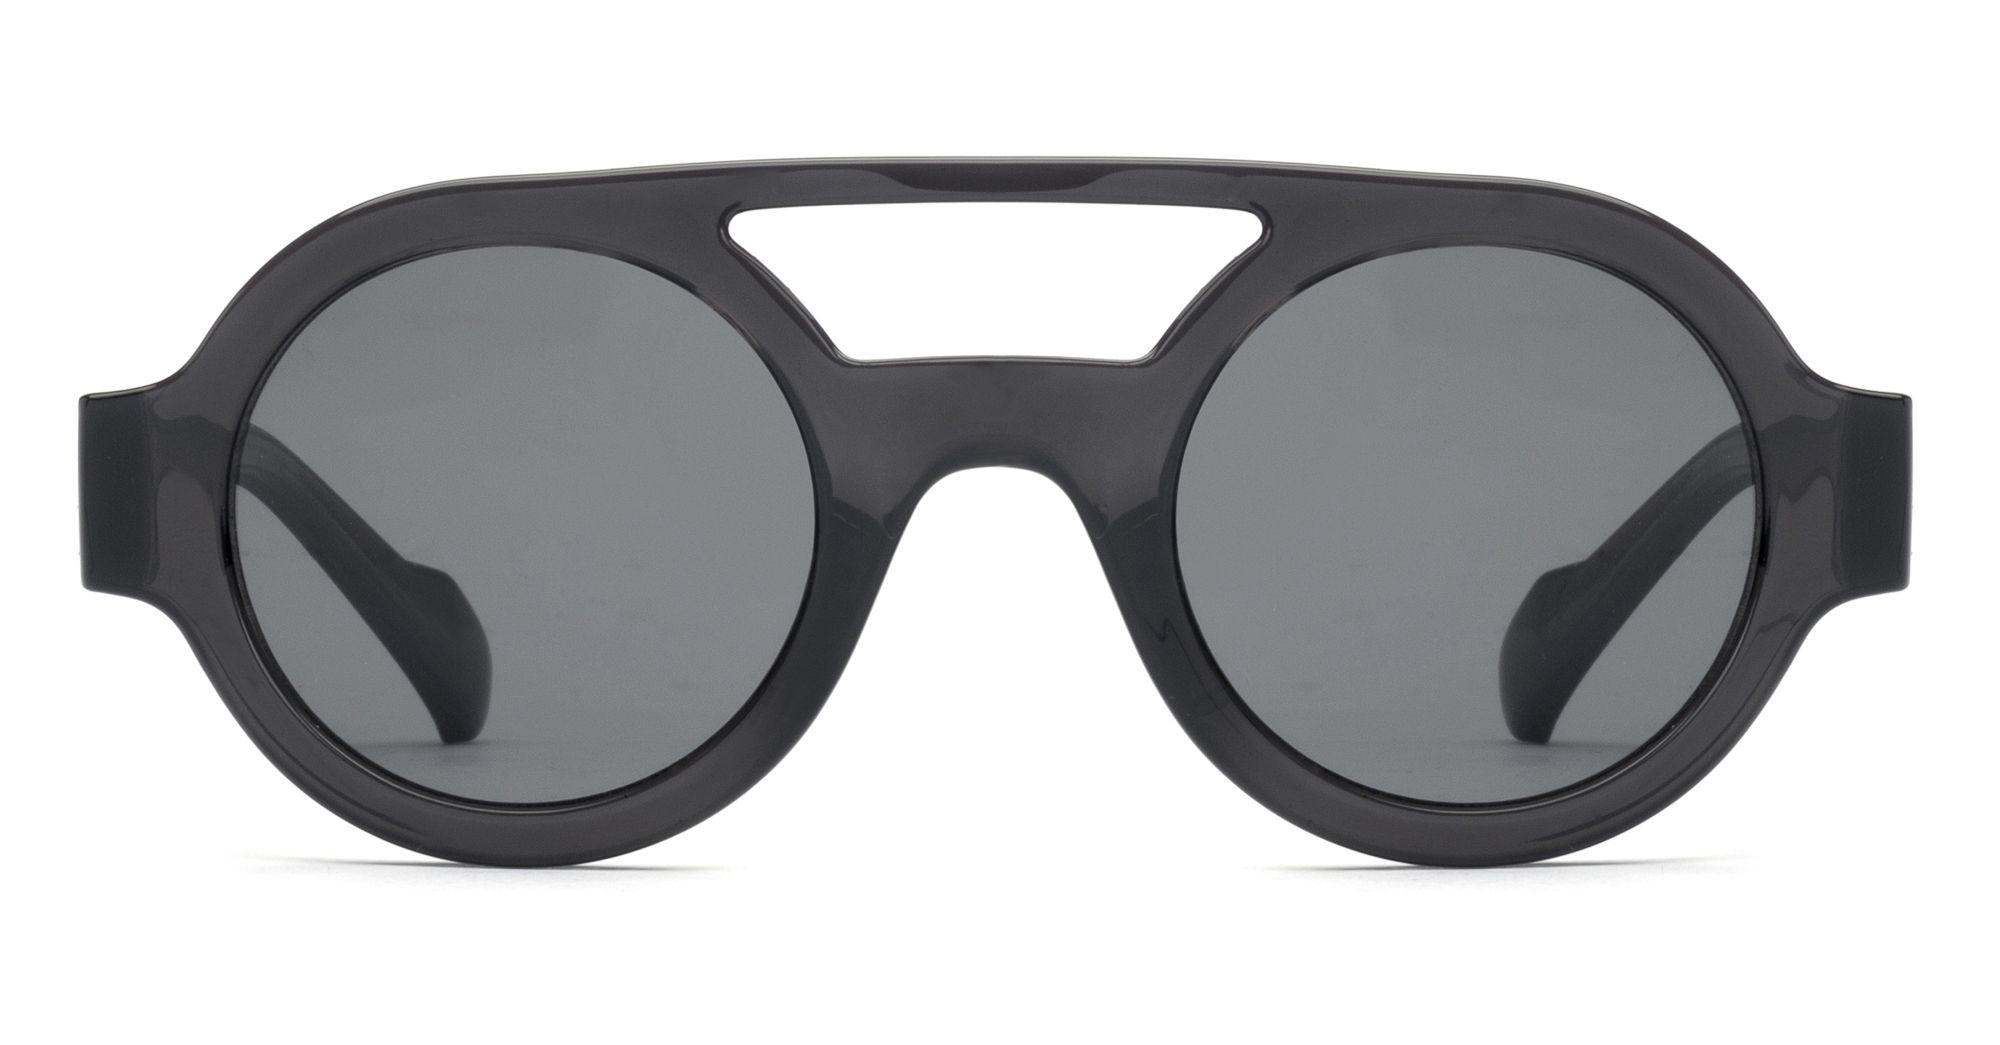 banco buffet Heredero  Adidas Originals eyewear | Adidas originals, Eyewear, Eyewear inspiration